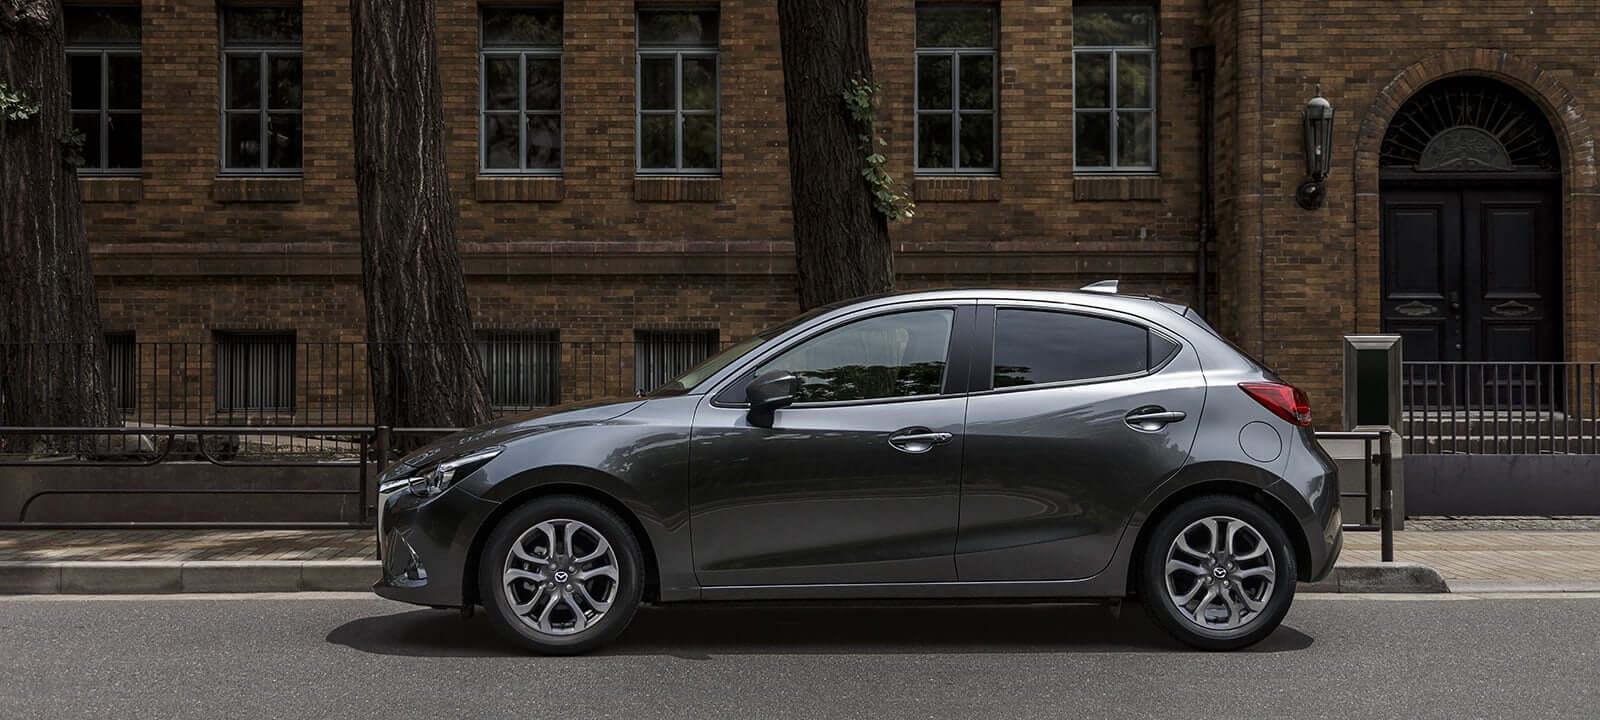 Mazda New Mazda2 Sport 1.5L V 6MT - Galería interior - imágen 0